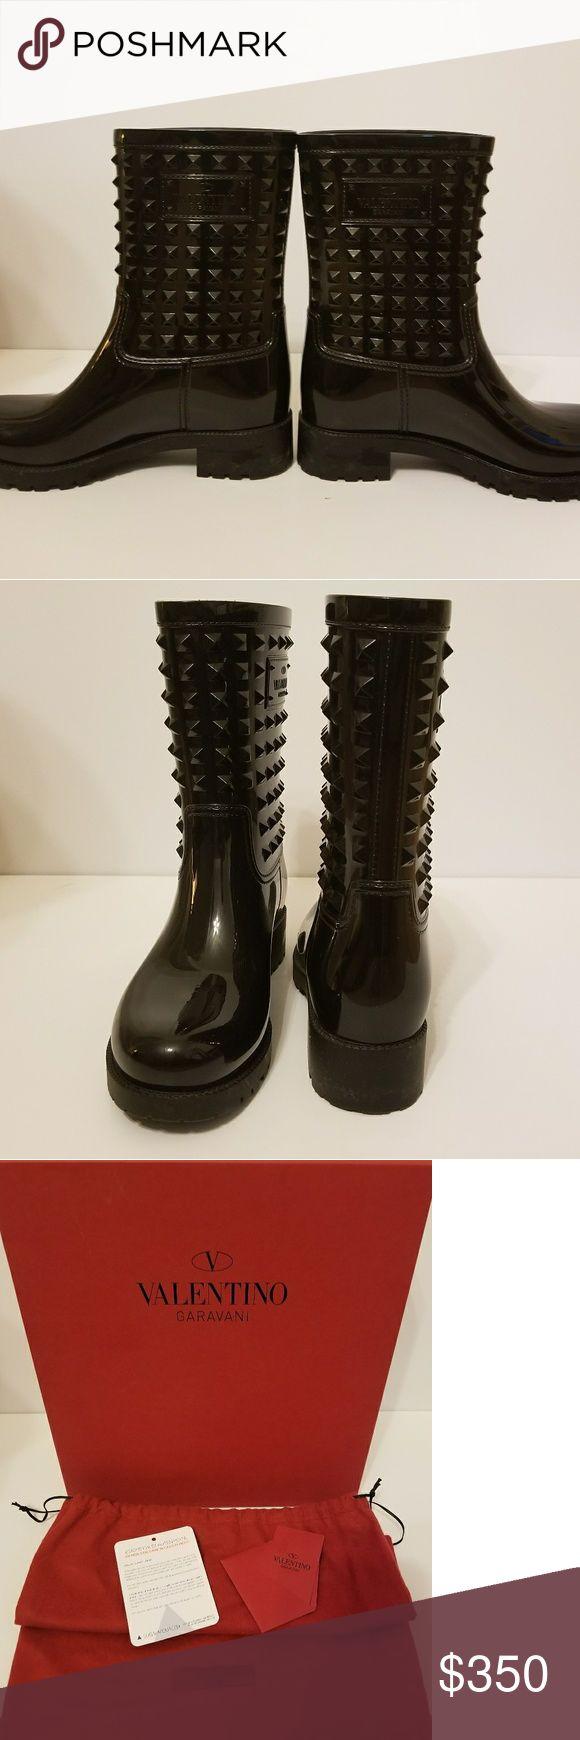 Valentino Rain Boot Authentic Valentino Rockstud Rain Boot in original packaging. Worn once EUC Valentino Shoes Winter & Rain Boots